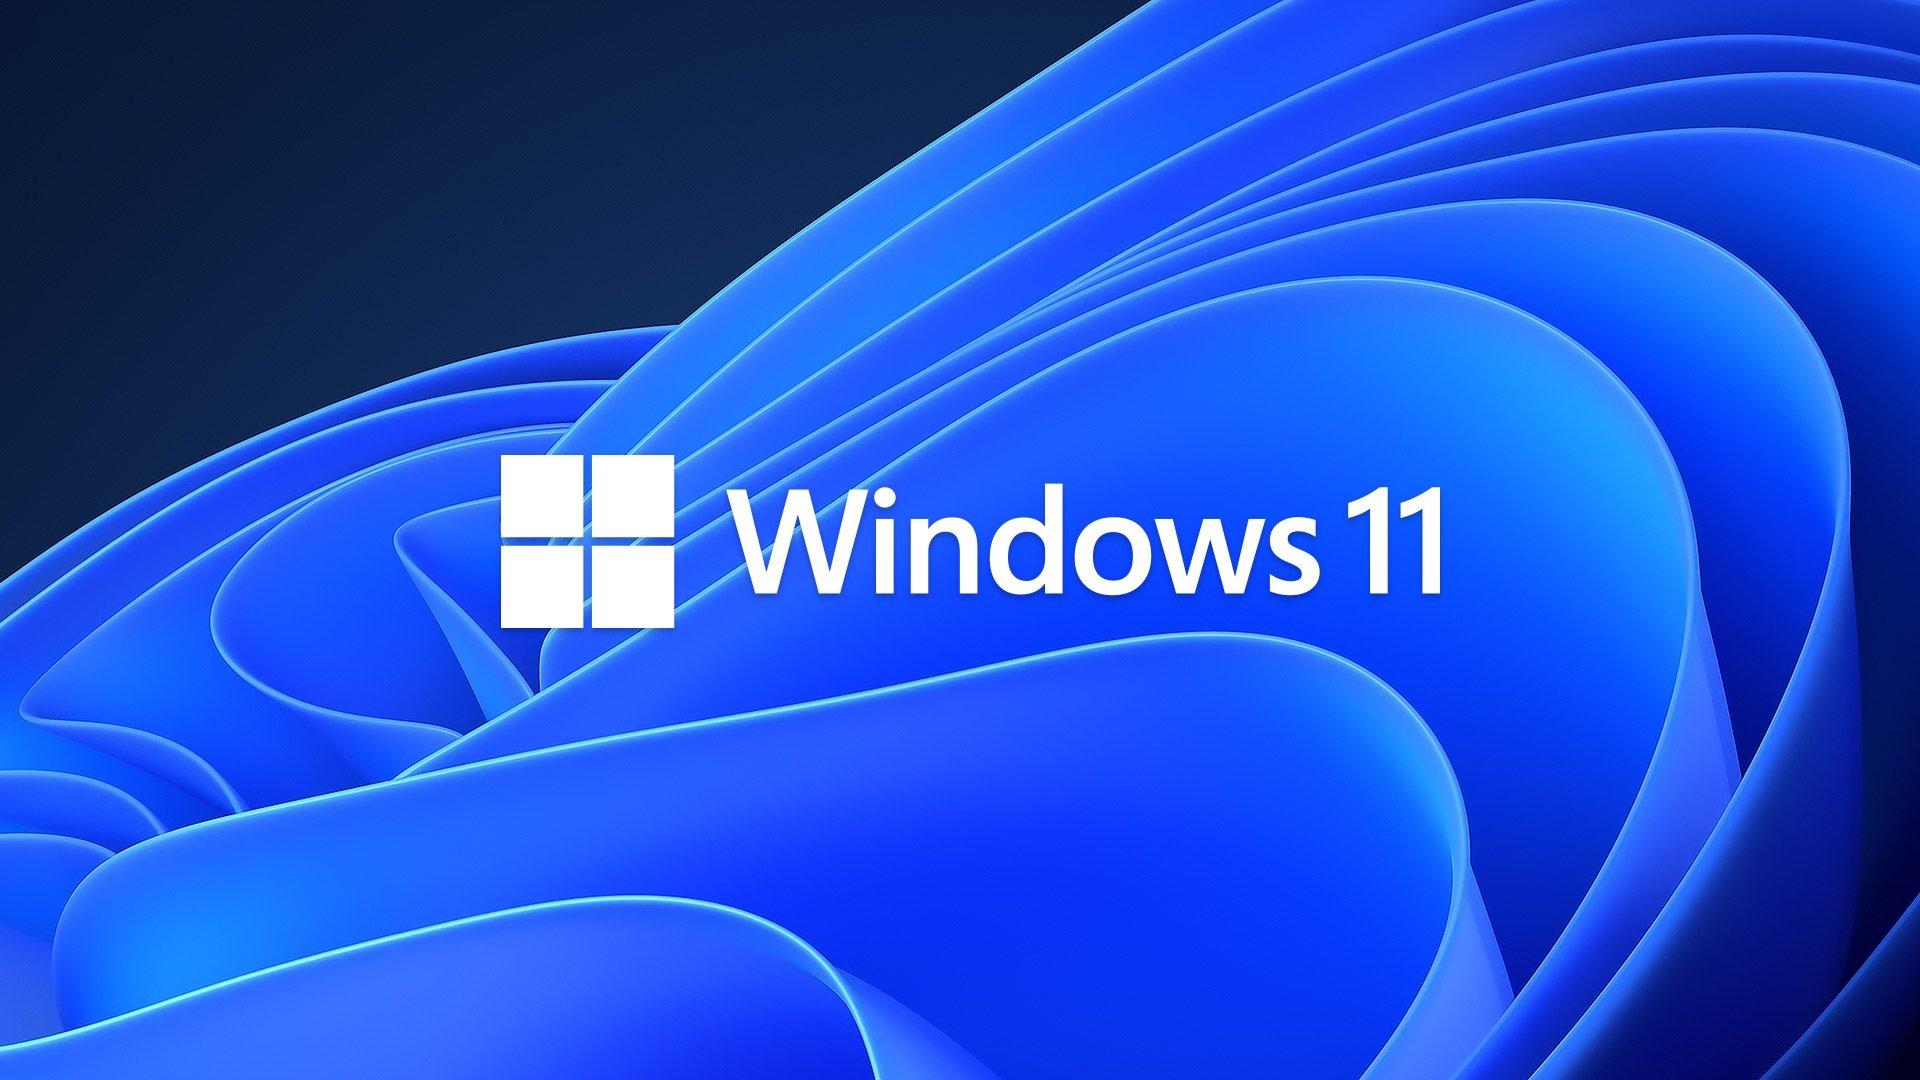 Windows 11 logo wallpaper